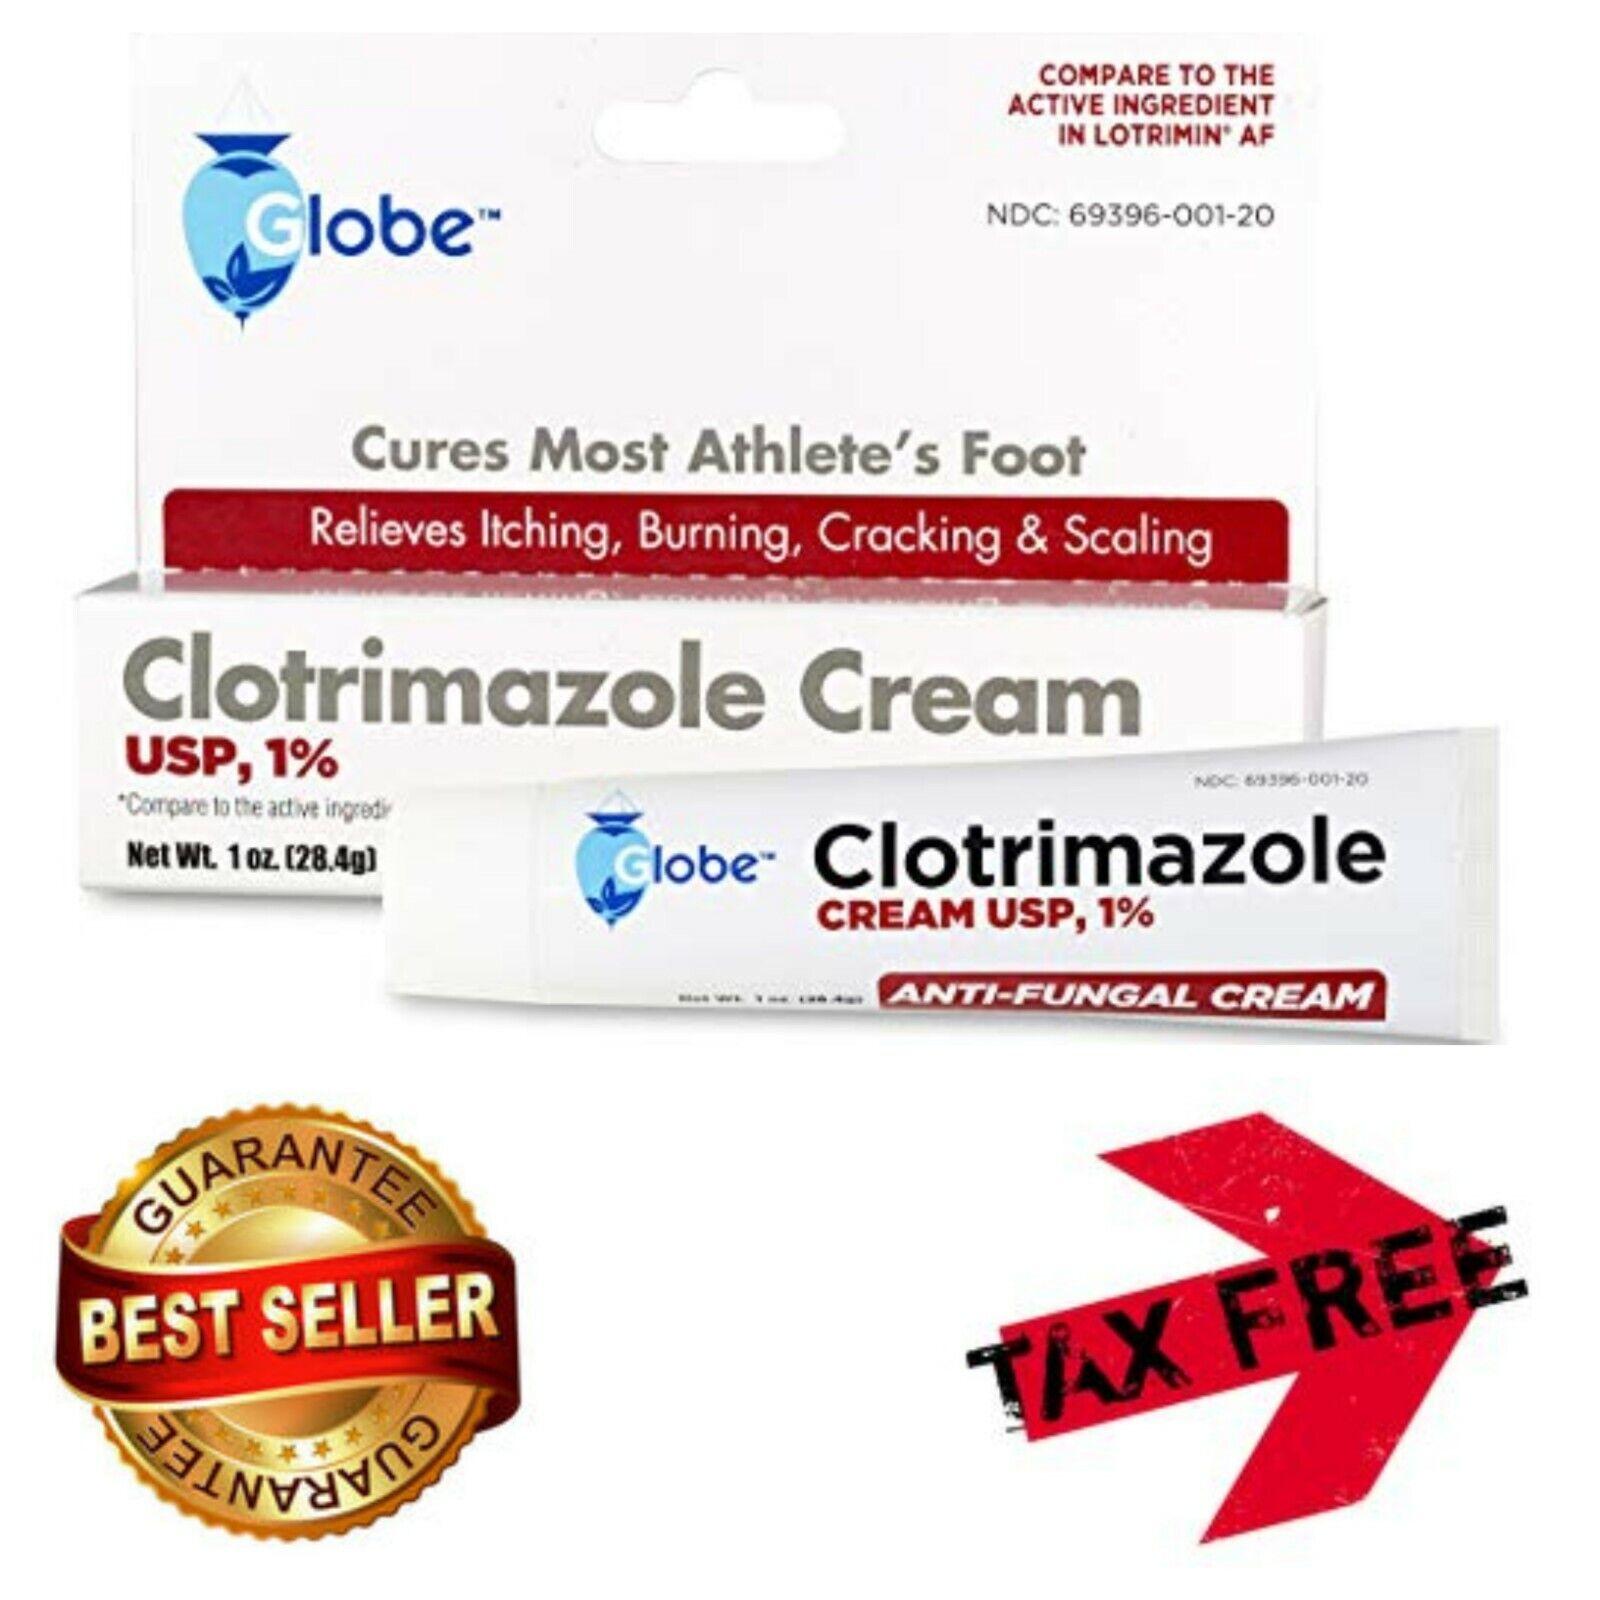 Clotrimazole Antifungal Cream 1% USP Athletes Foot Treatment